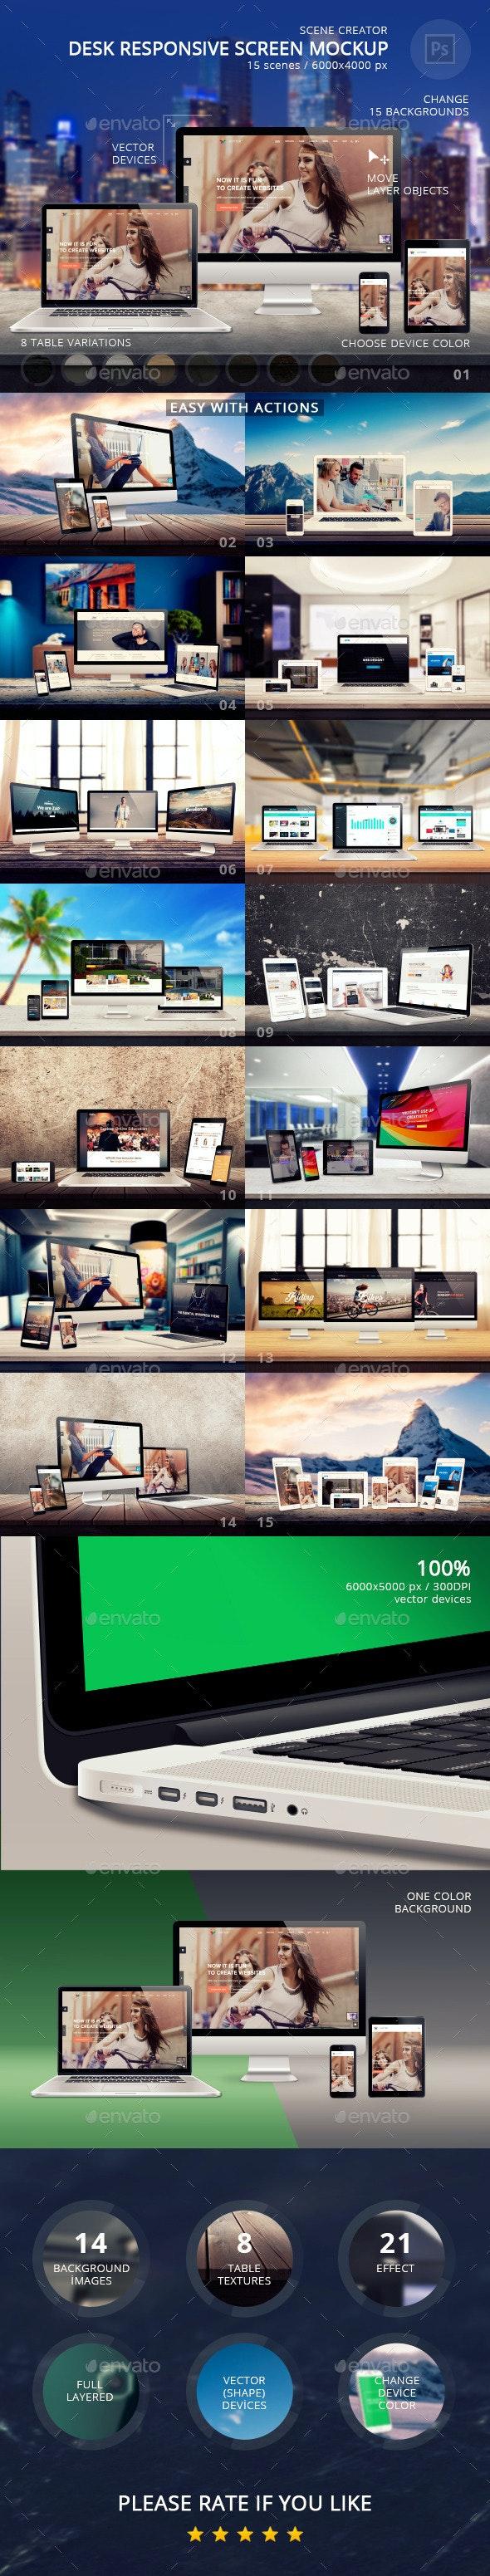 Desk Responsive Screen Mockup - Multiple Displays